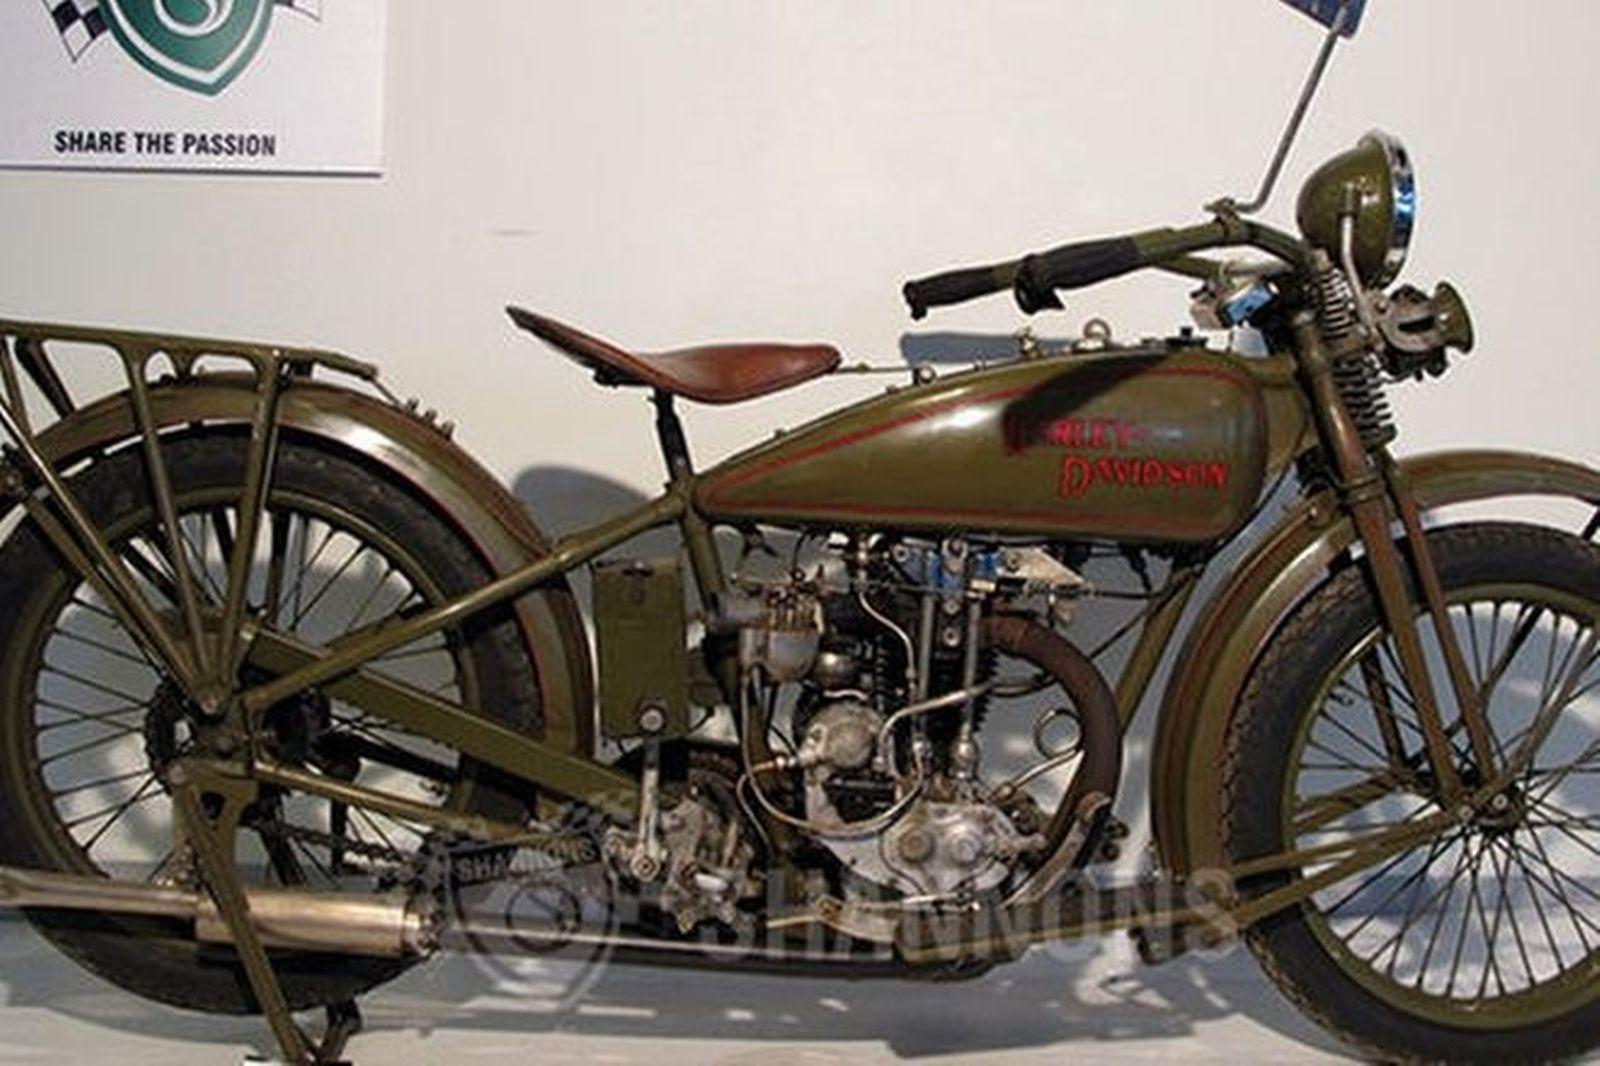 1928 Harley Davidson Ohv Peashooter: Sold: Harley-Davidson 27B 350cc (OHV) Peashooter